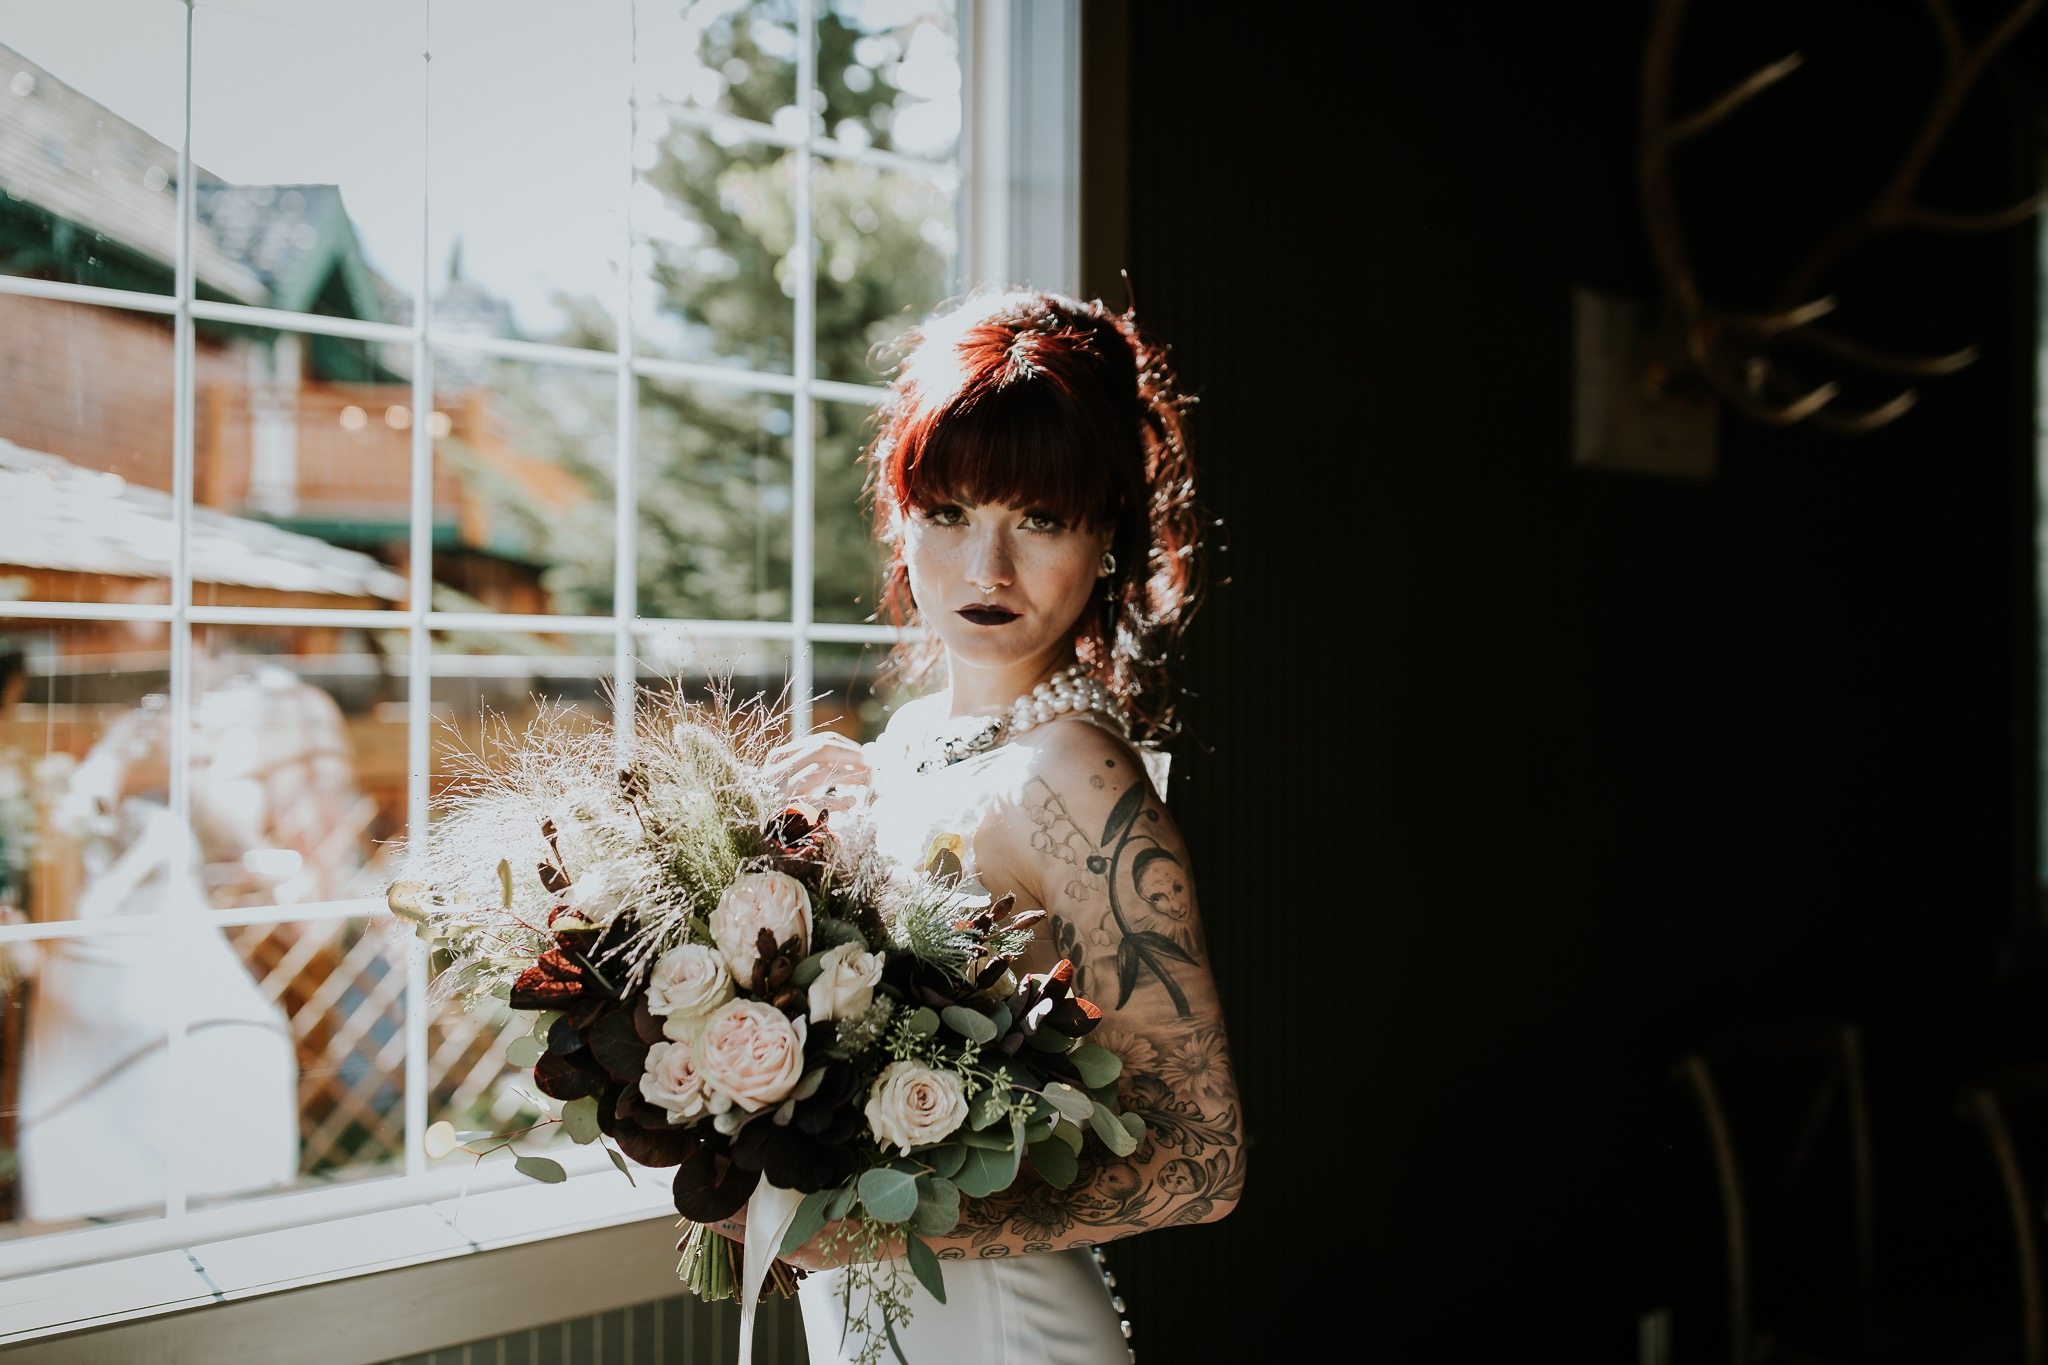 20170915-canmore-moody-wedding-photographer-creekside-creeksidestyledshoot-time&fate-5568